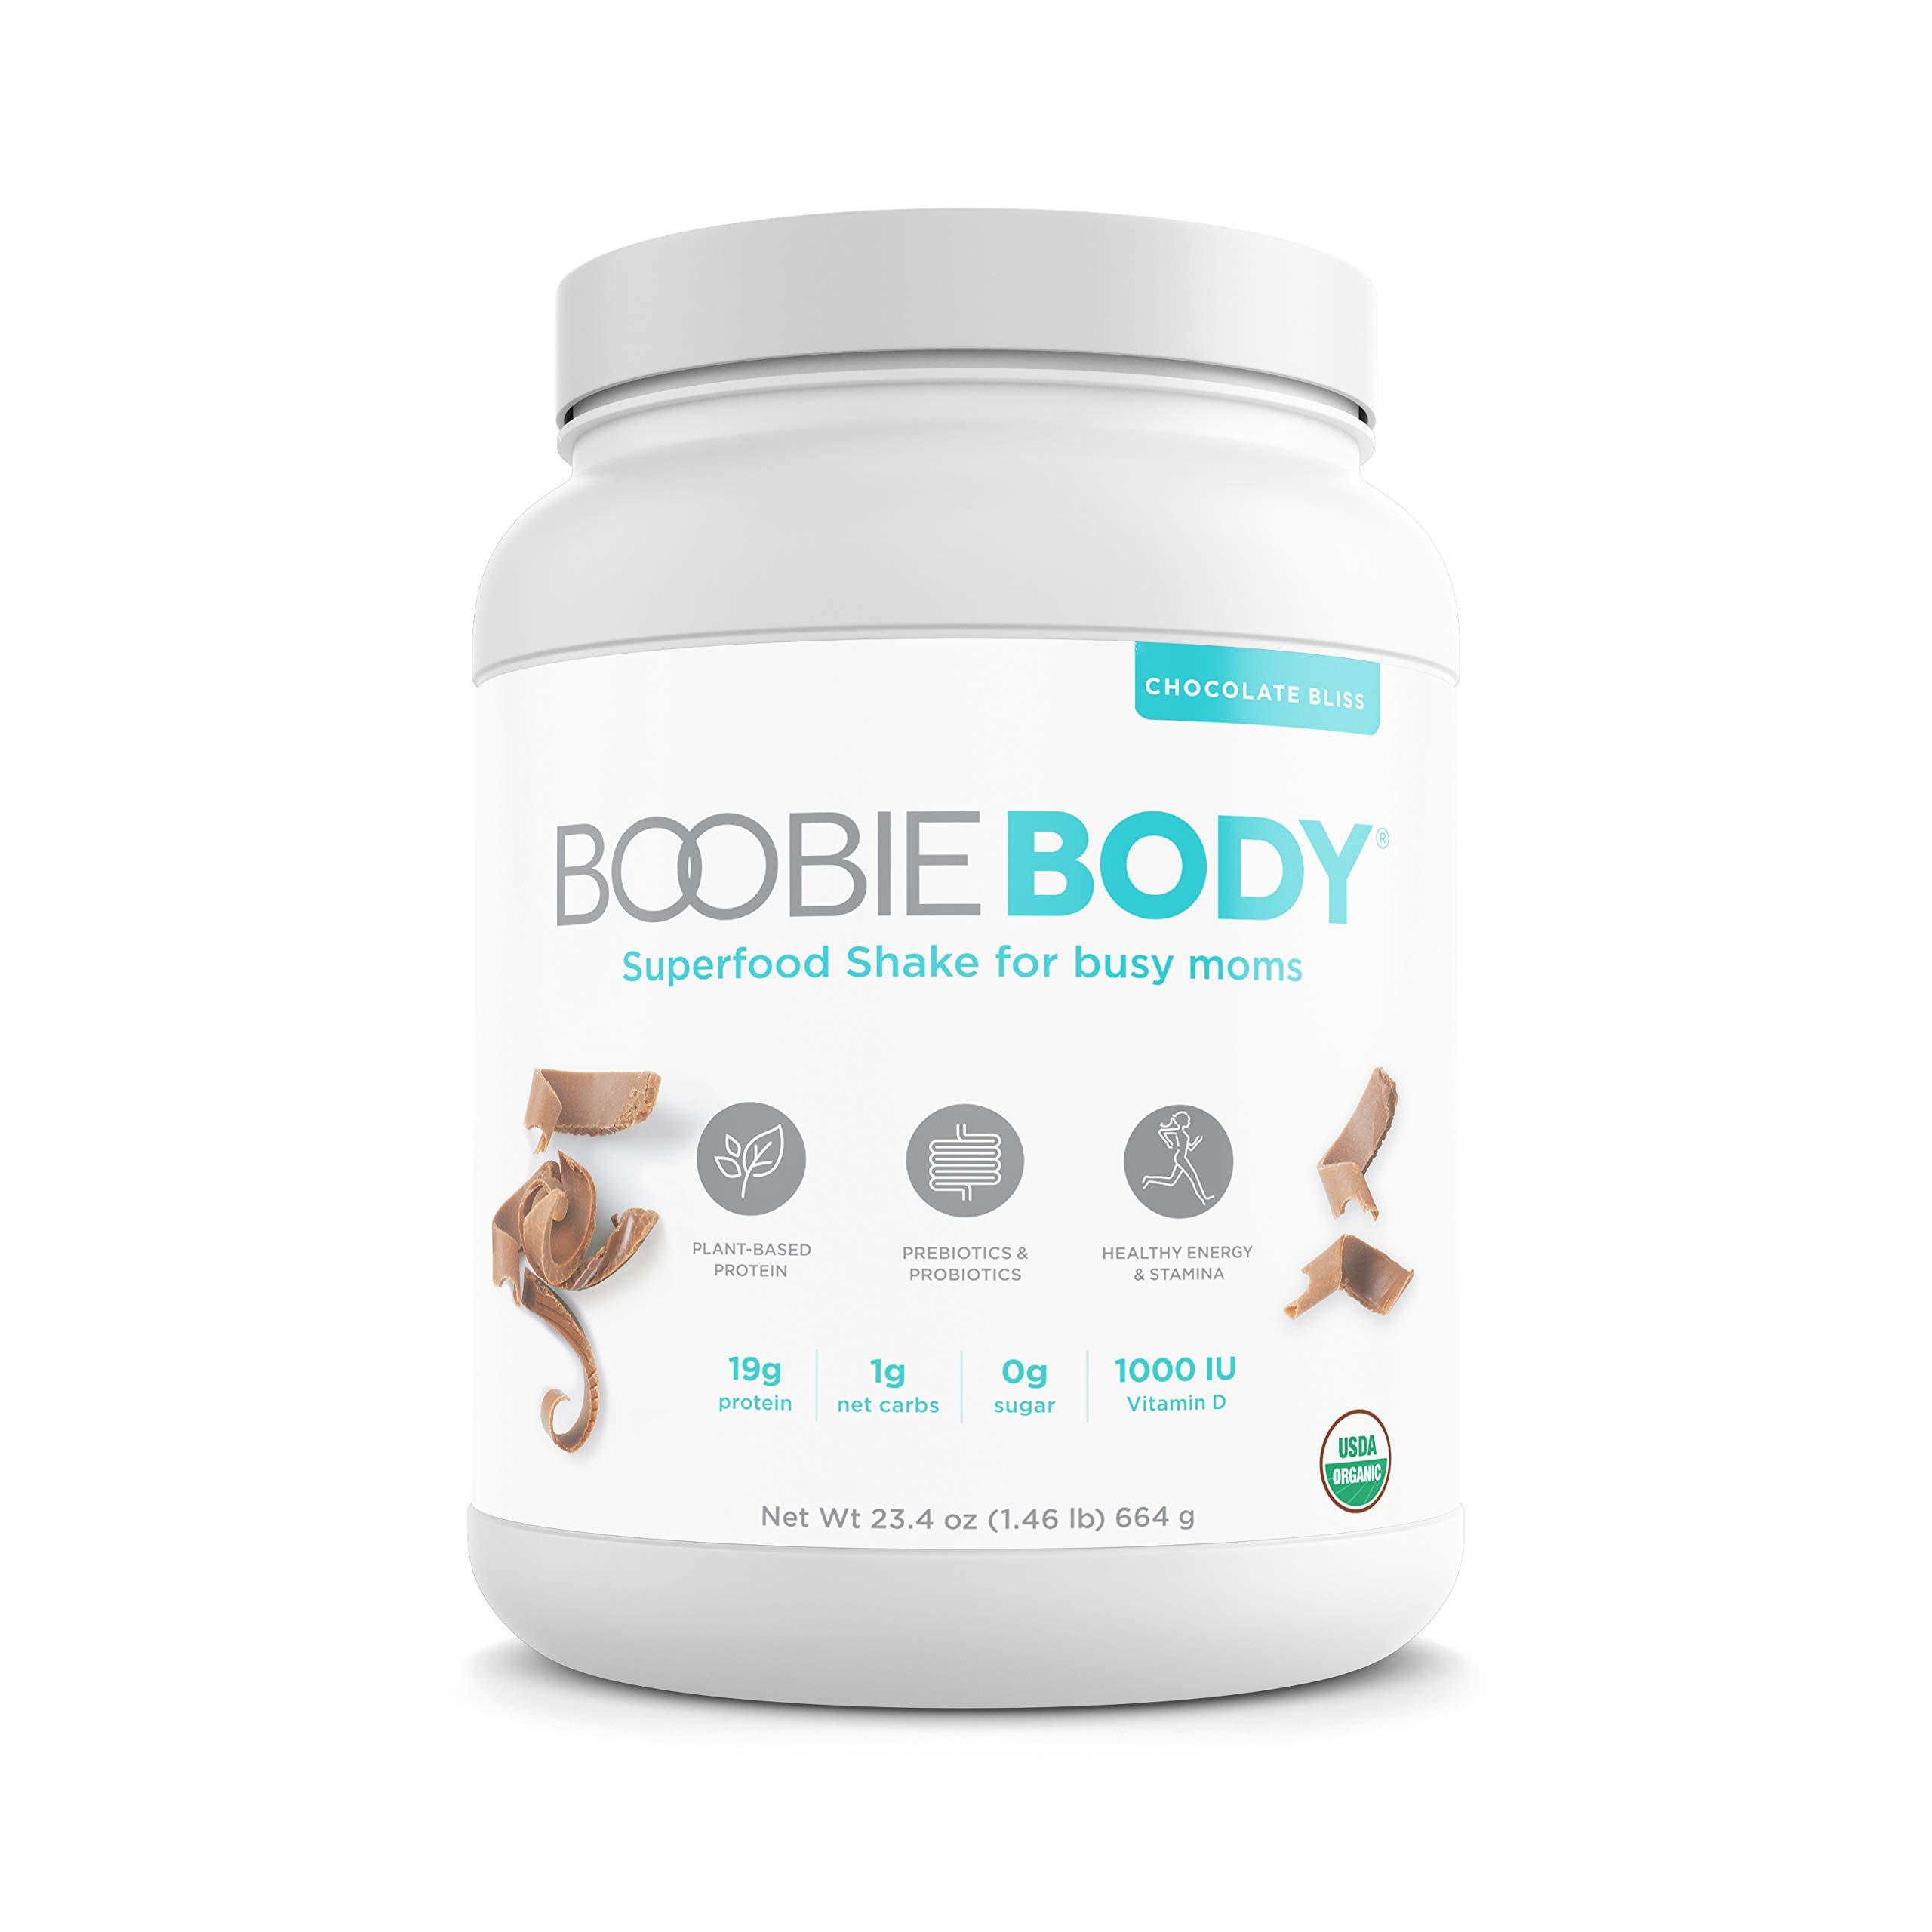 Boobie BODY Organic Superfood Shake, Protein-Plant-Based, Prebiotics & Probiotics, 20 servings, Chocolate Bliss, 23.4 oz.